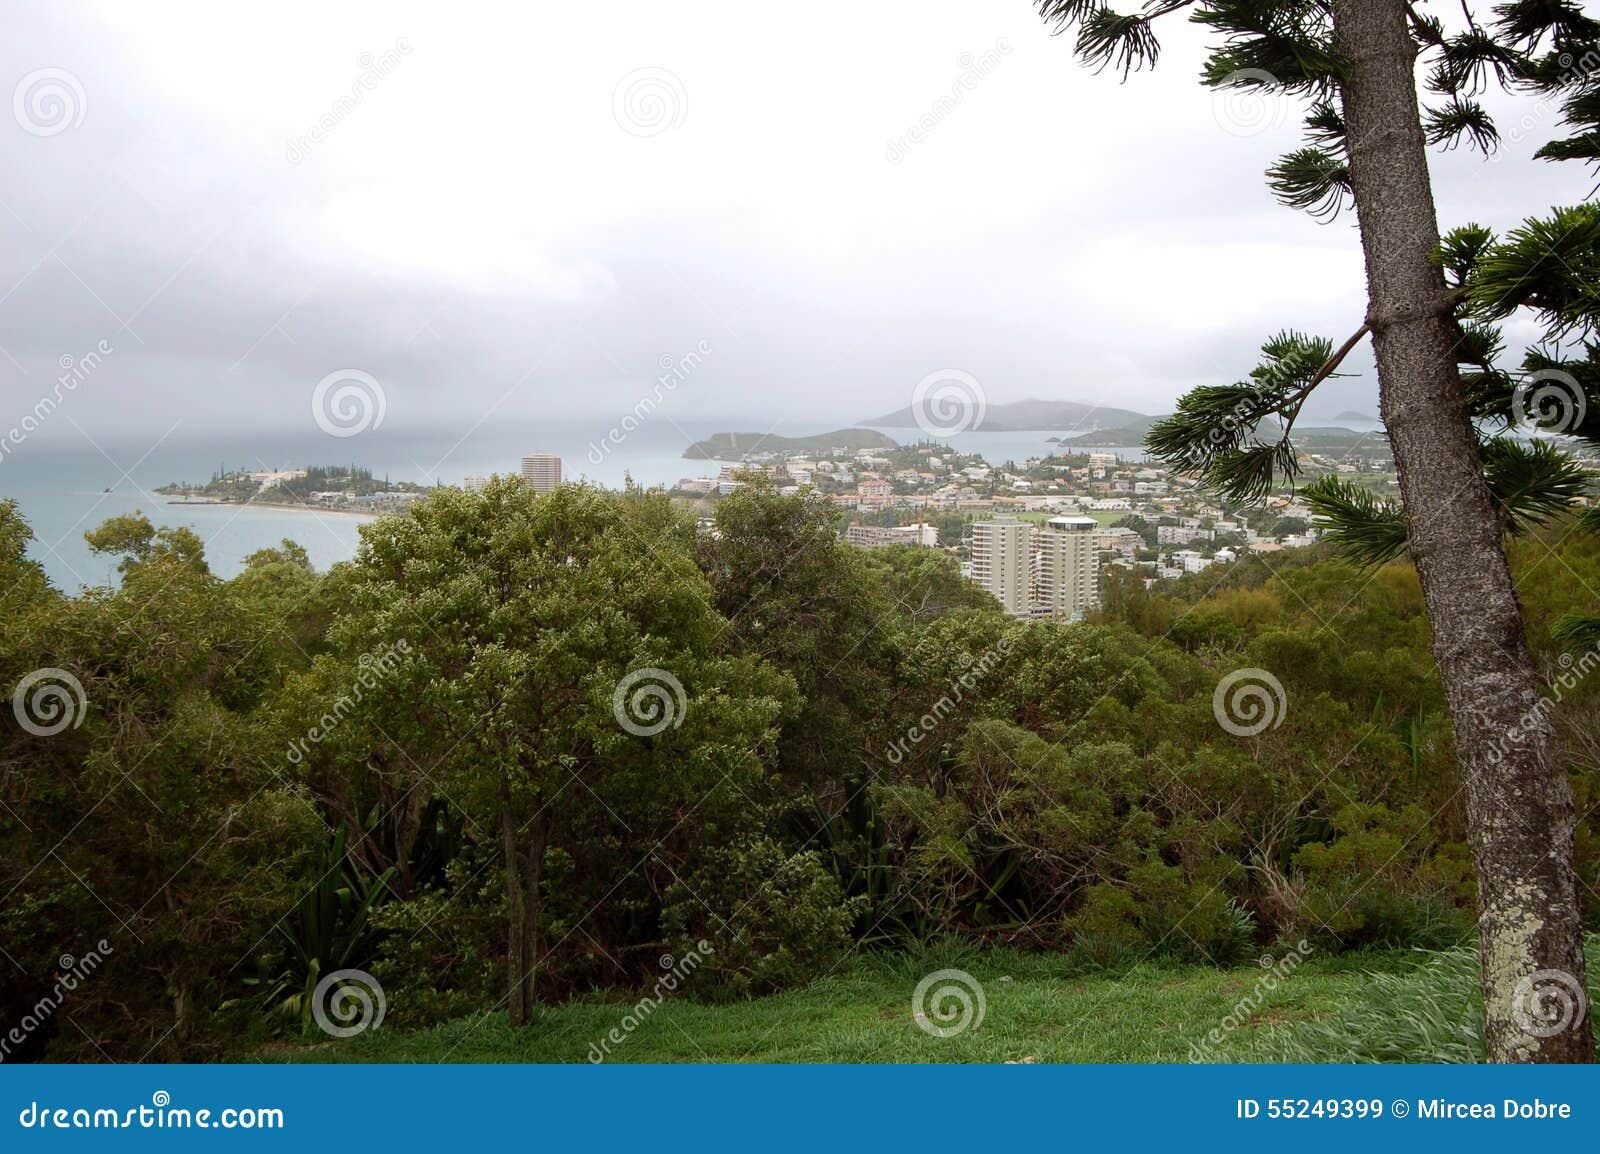 View of Noumea, New Caledonia